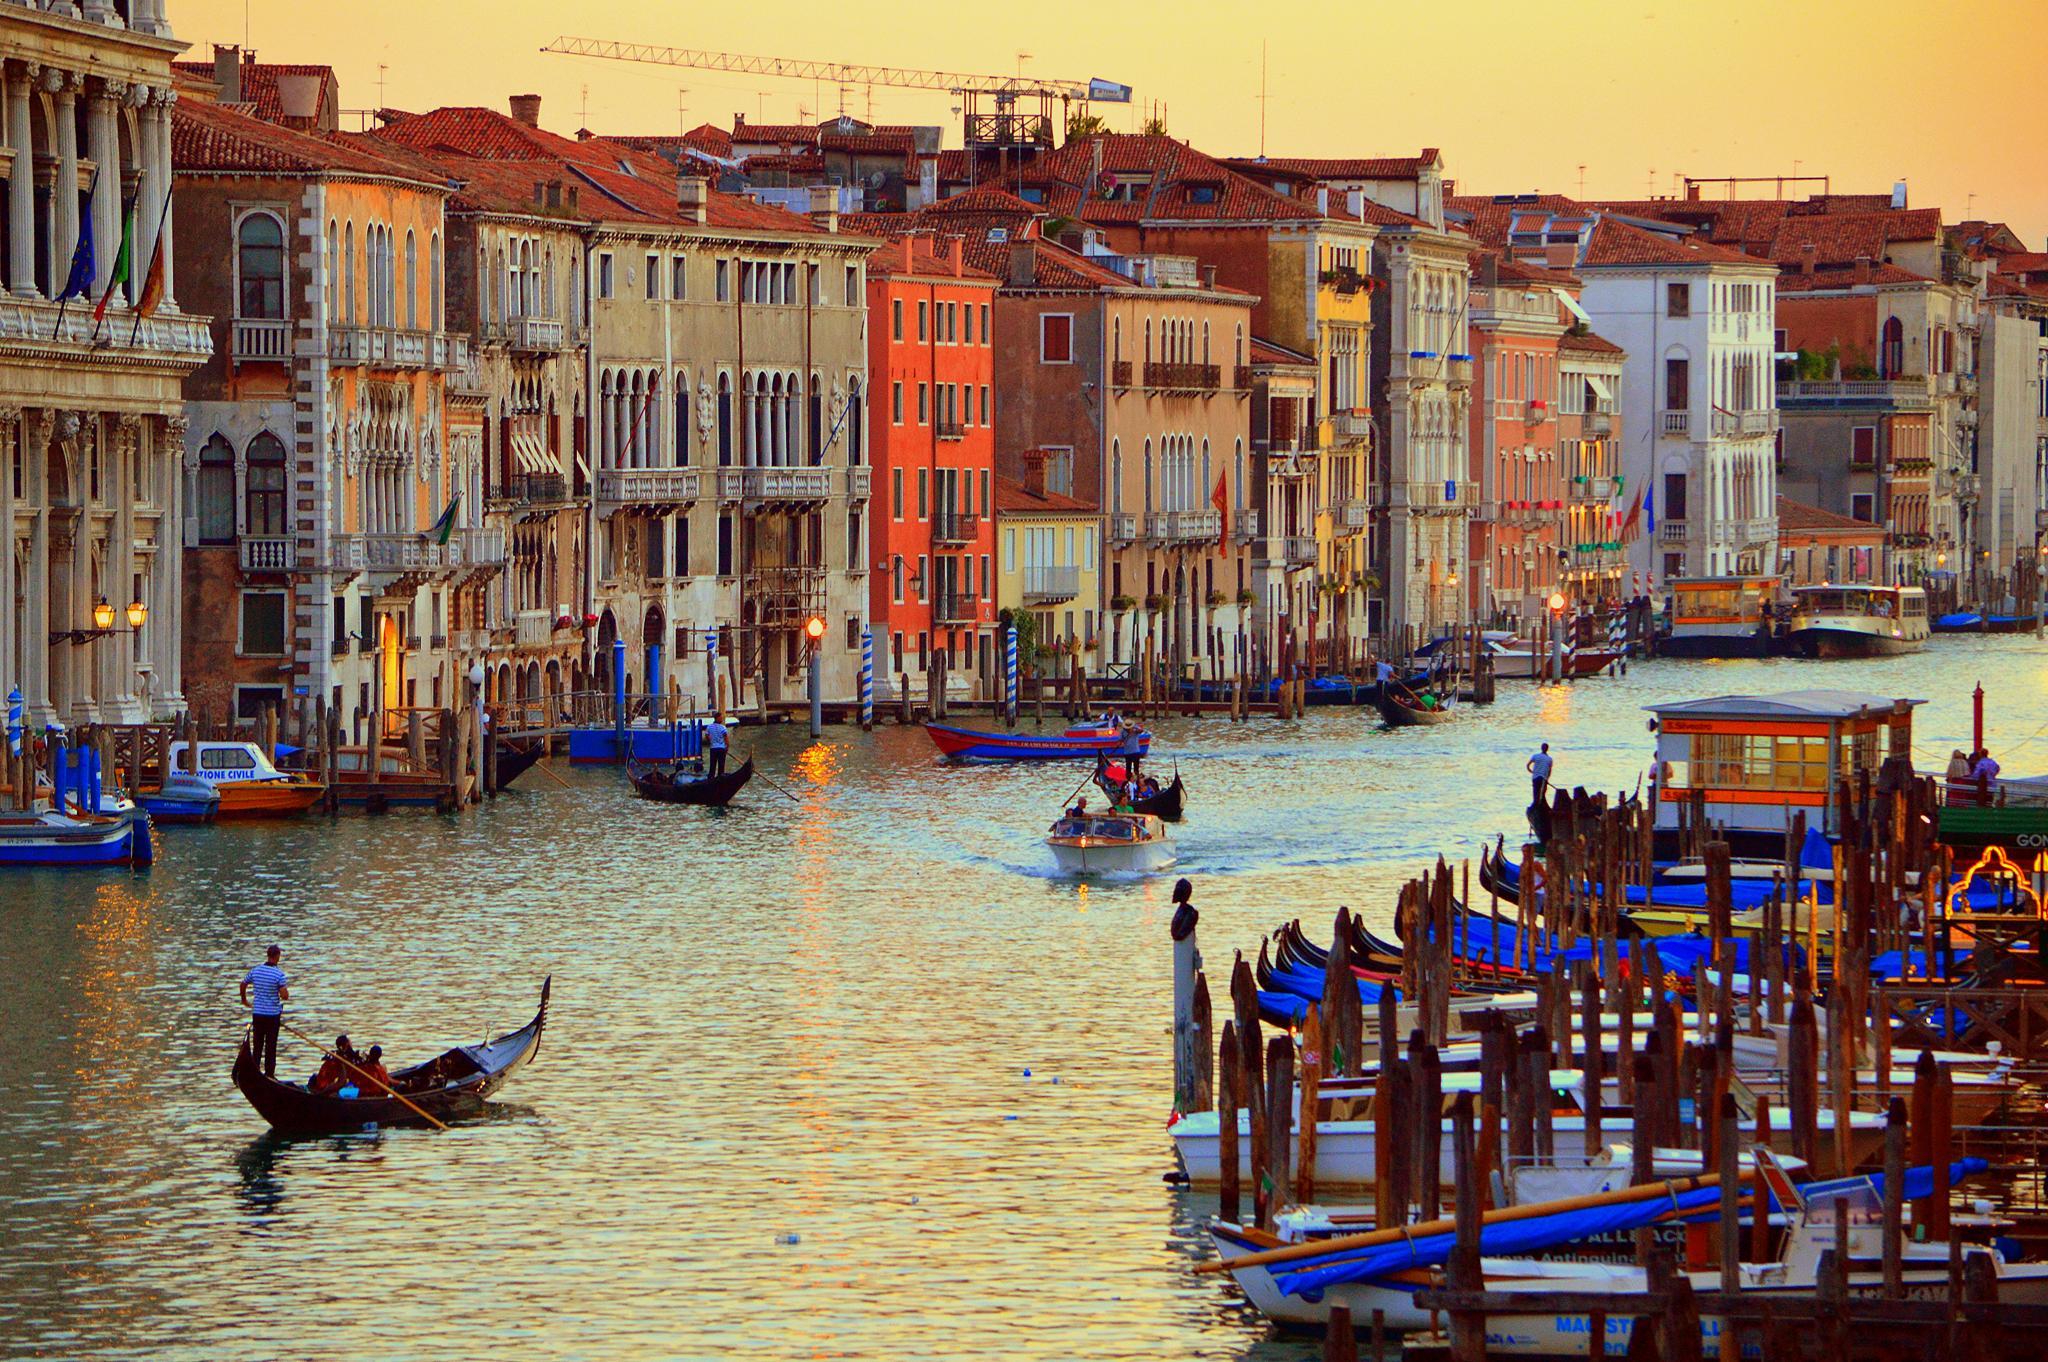 Venezia at sunset by Frederico Domondon